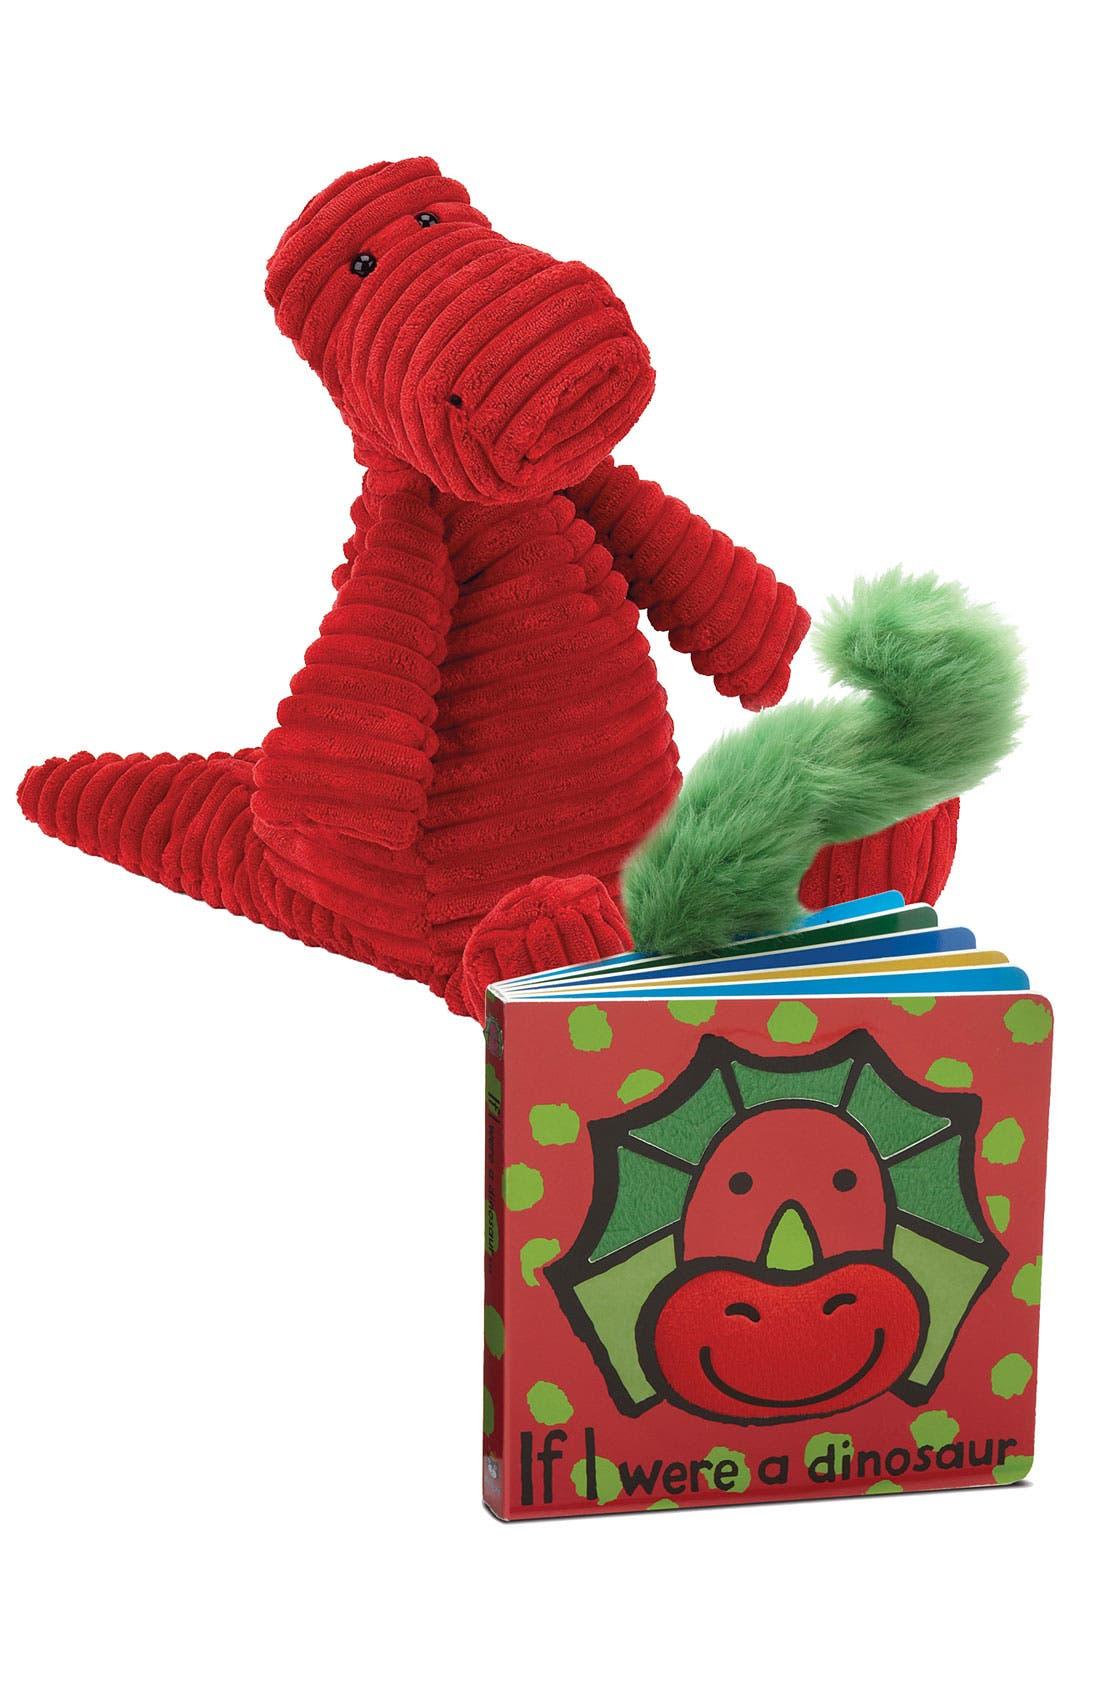 Main Image - Jellycat Dinosaur Book & Stuffed Animal